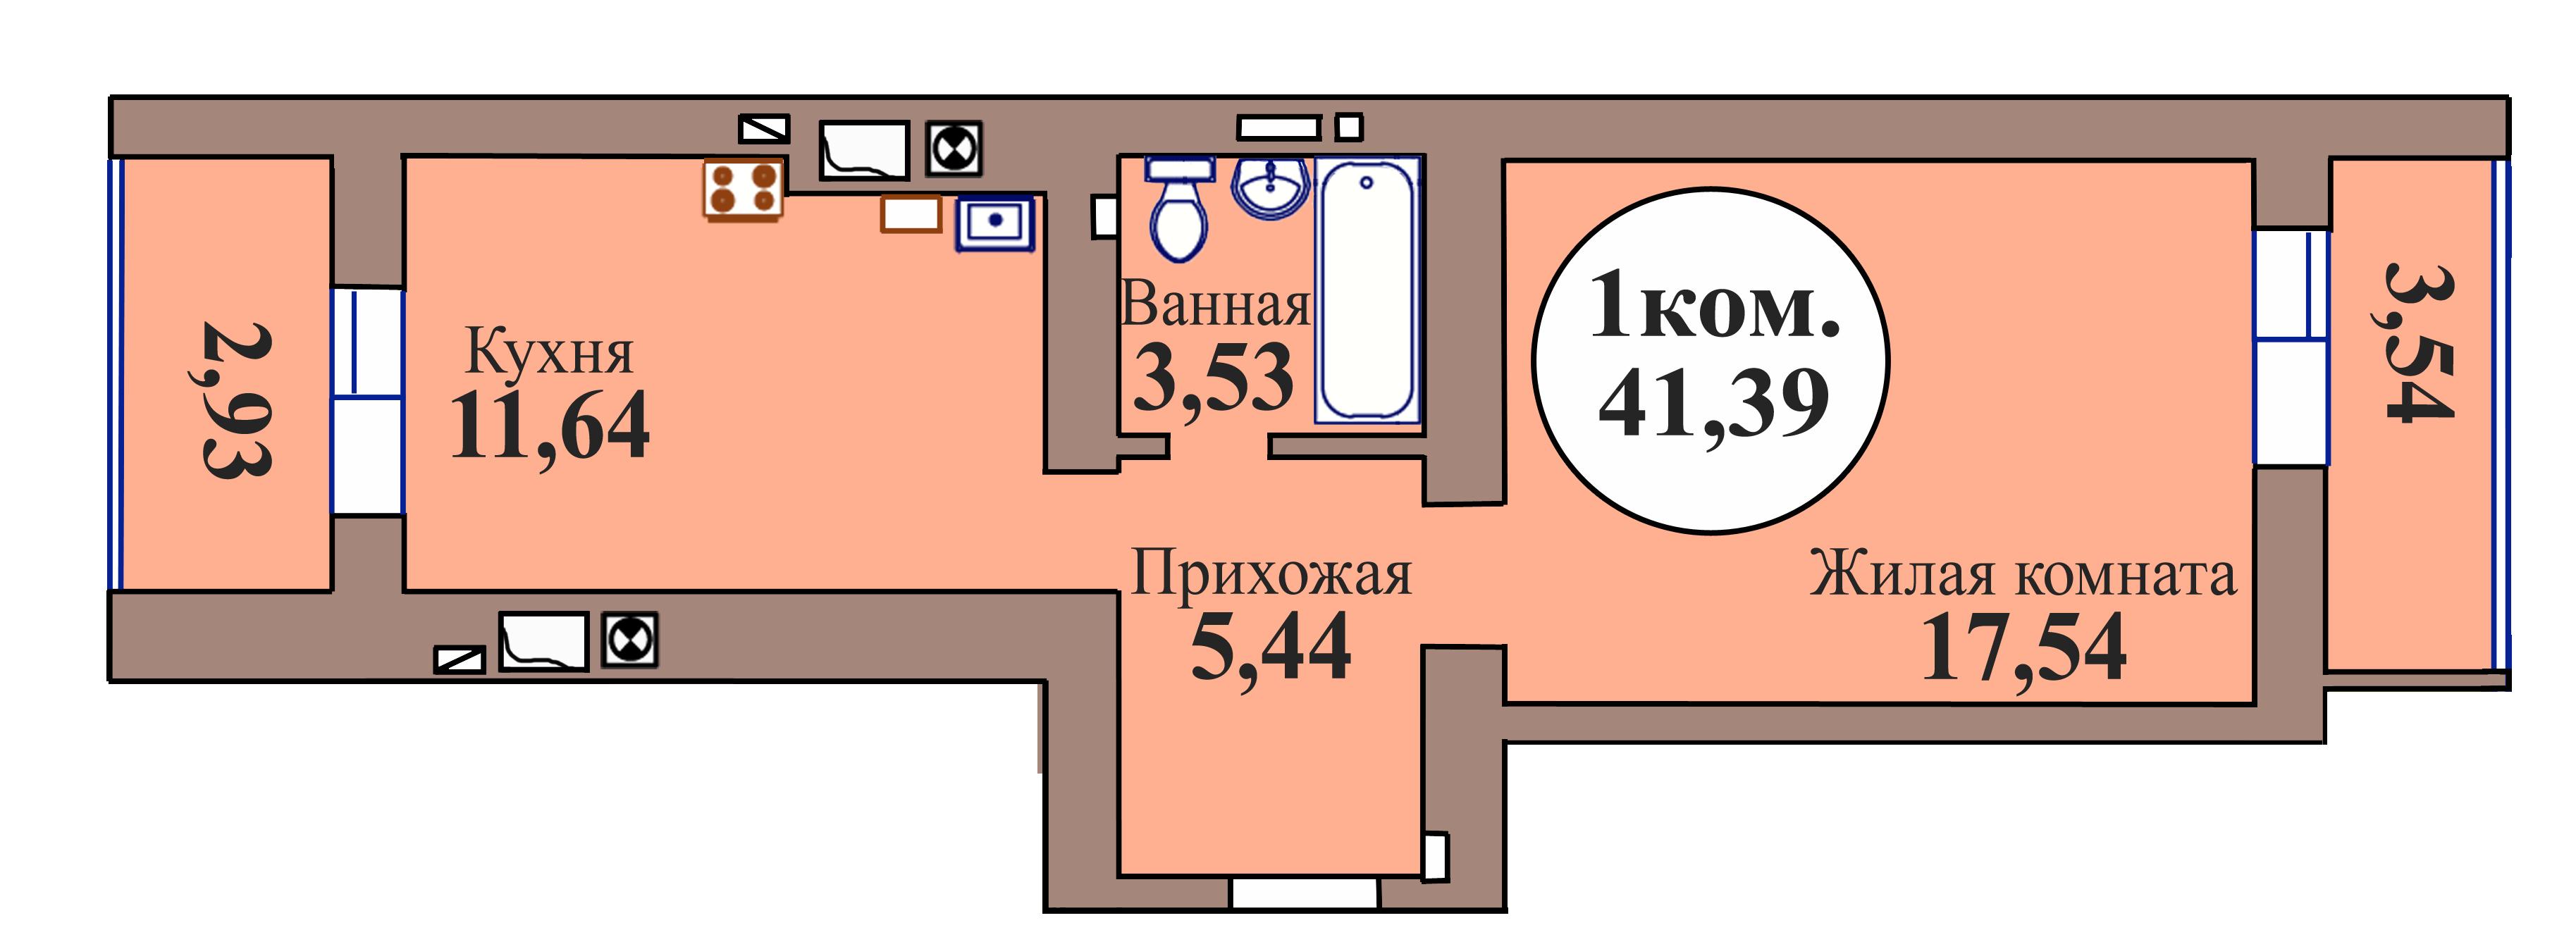 1-комн. кв. по пер. Калининградский, 5 кв. 47 в Калининграде